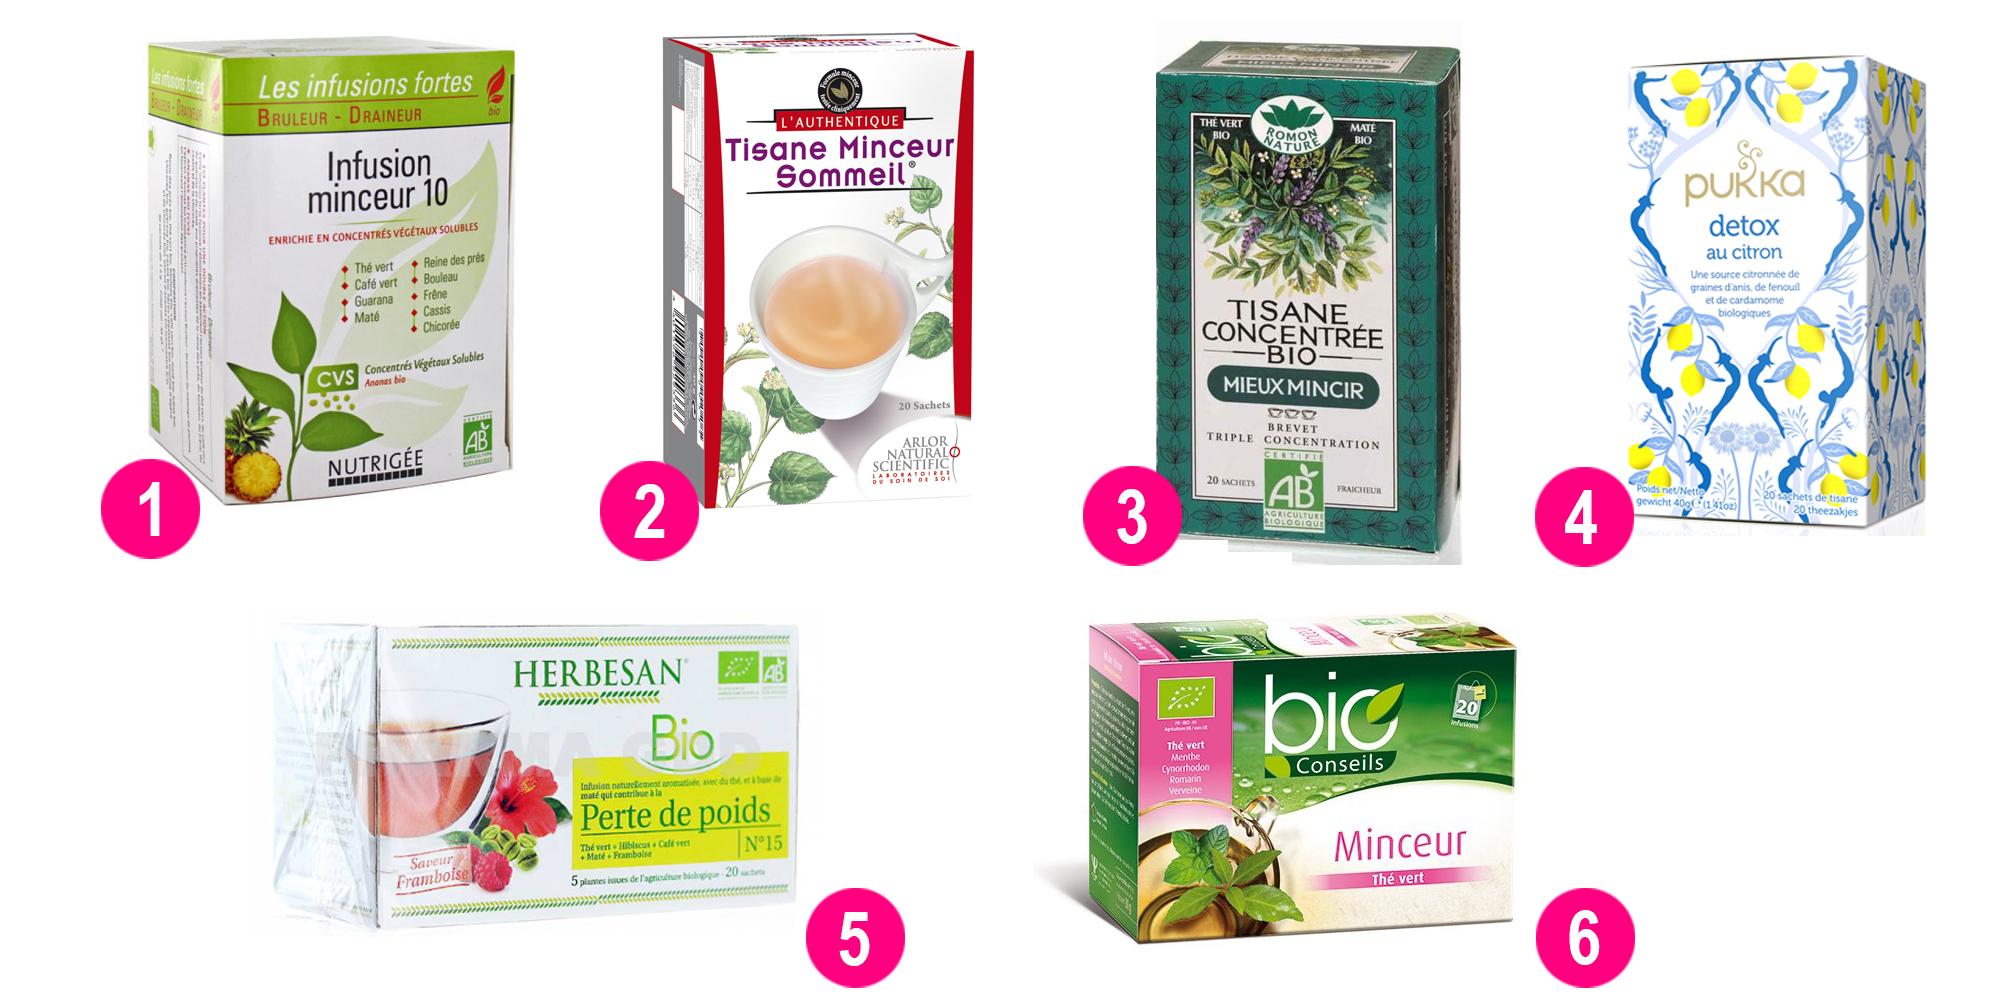 Maigrir avec du thé, ça marche ? | Fourchette & Bikini